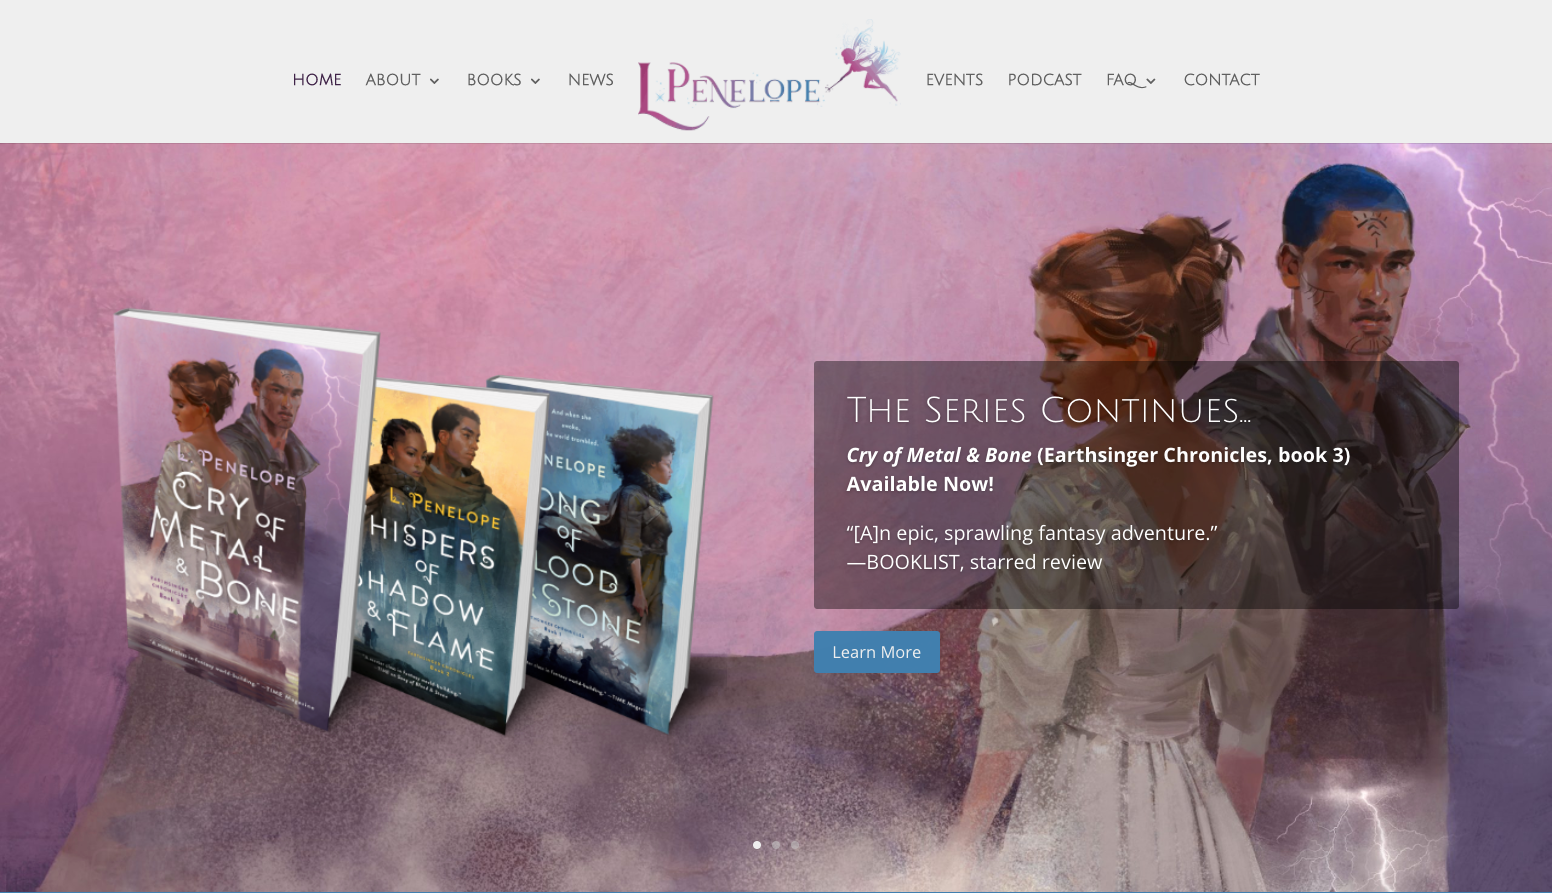 L. Penelope website